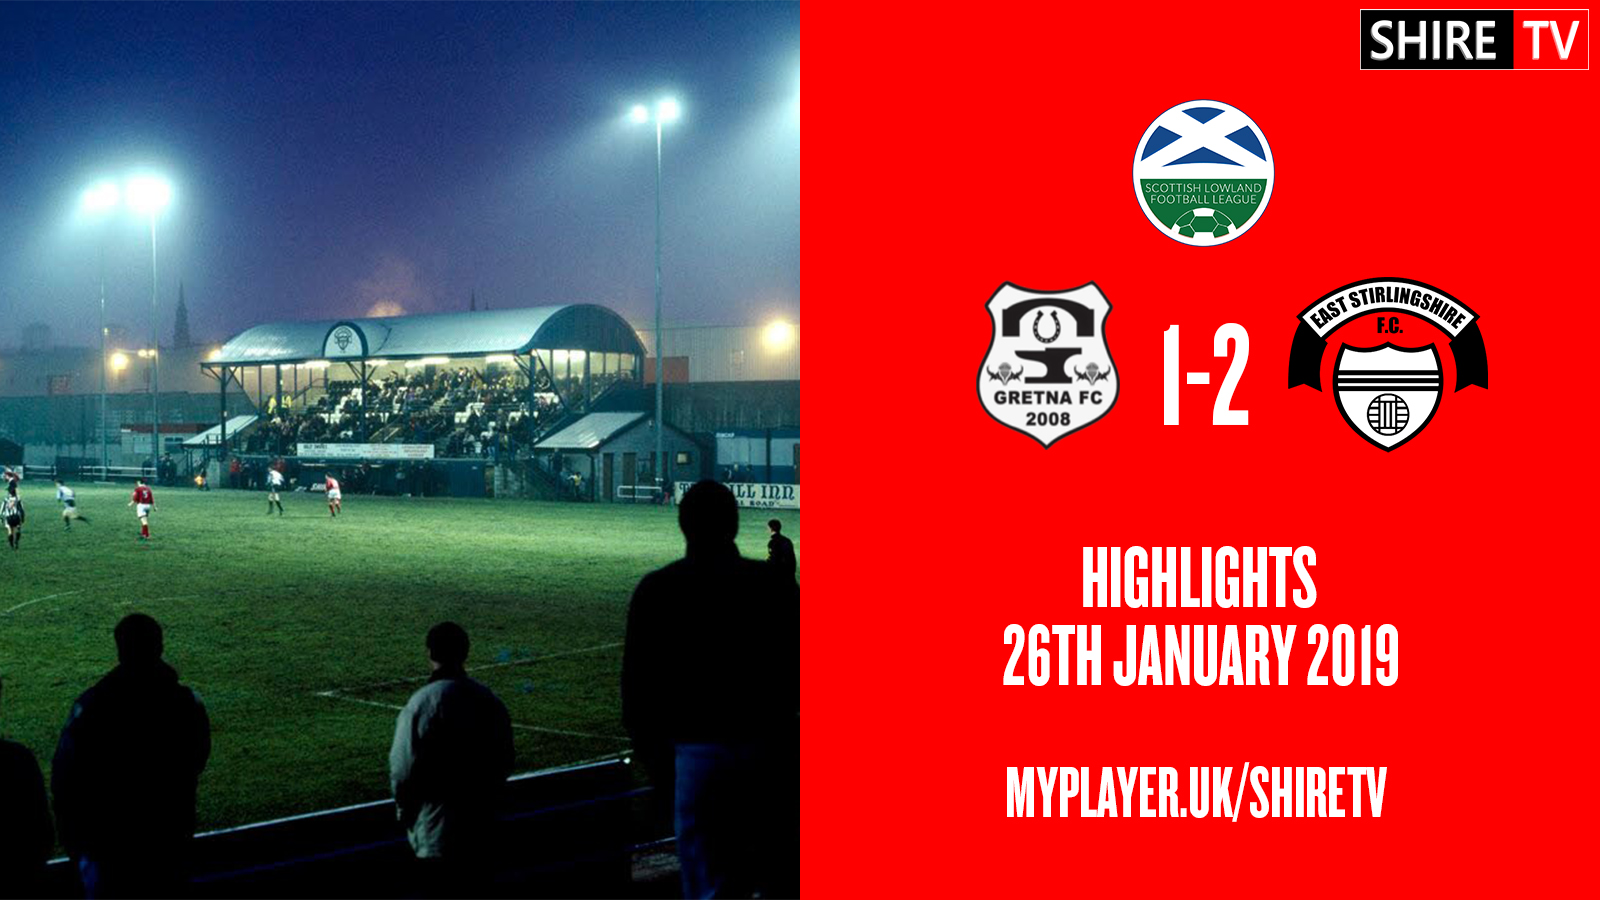 Gretna 2008 V East Stirlingshire (Lowland League 26th January 2019)